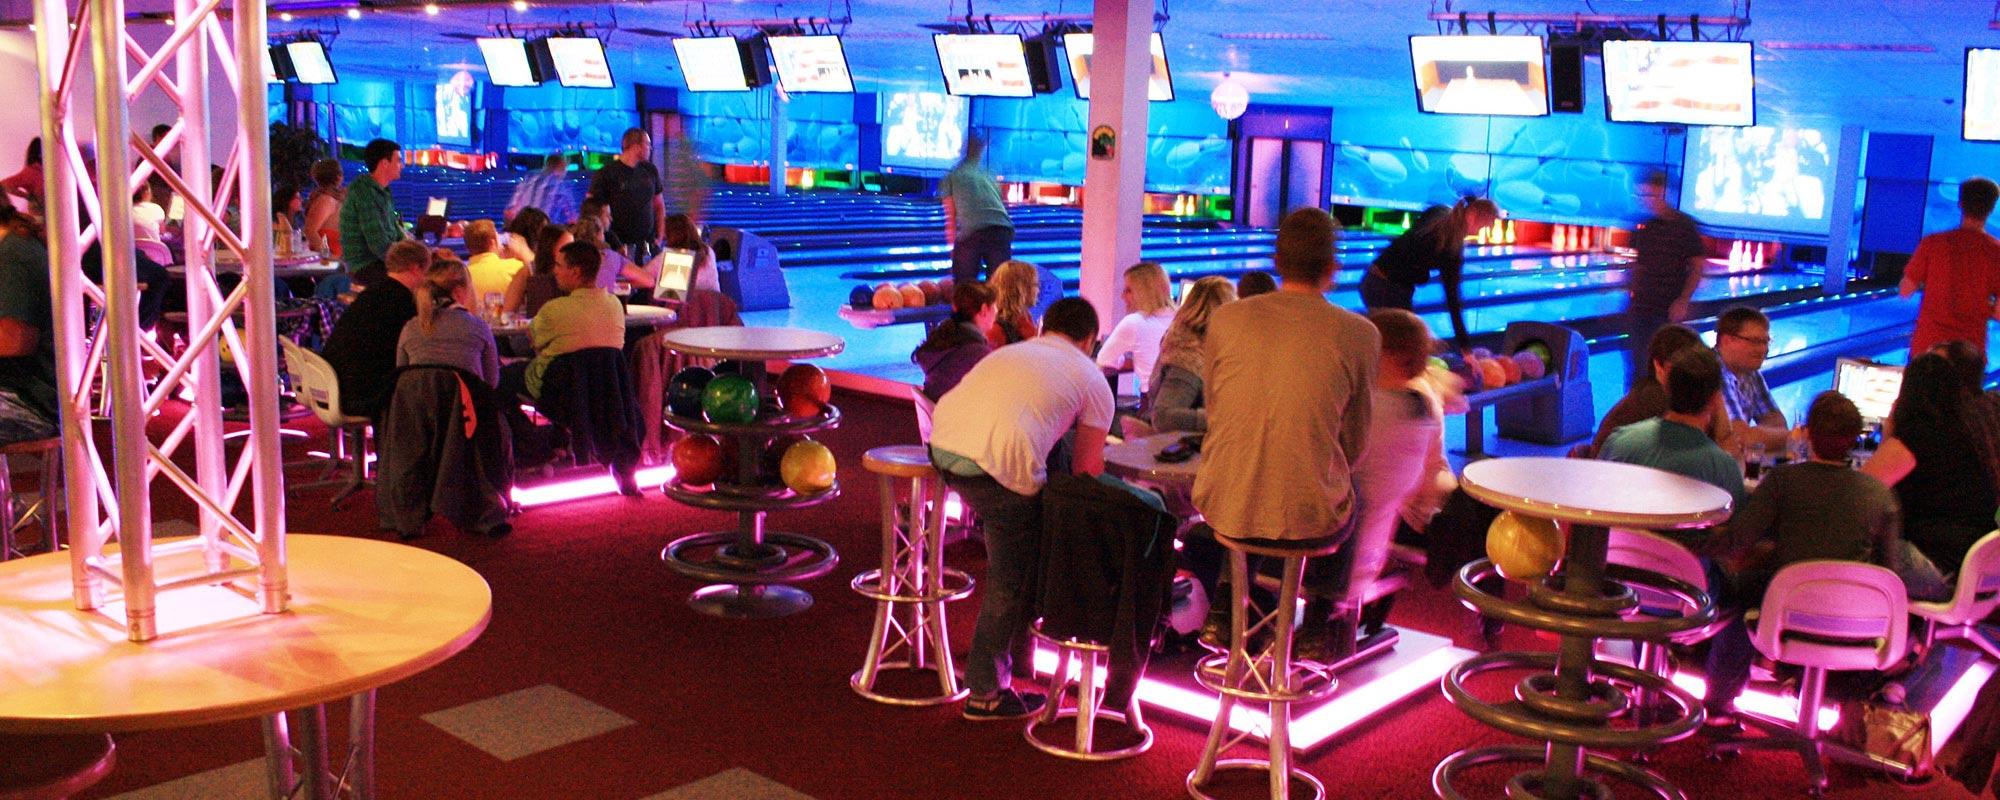 ebafkc-bowling-2000x800-07